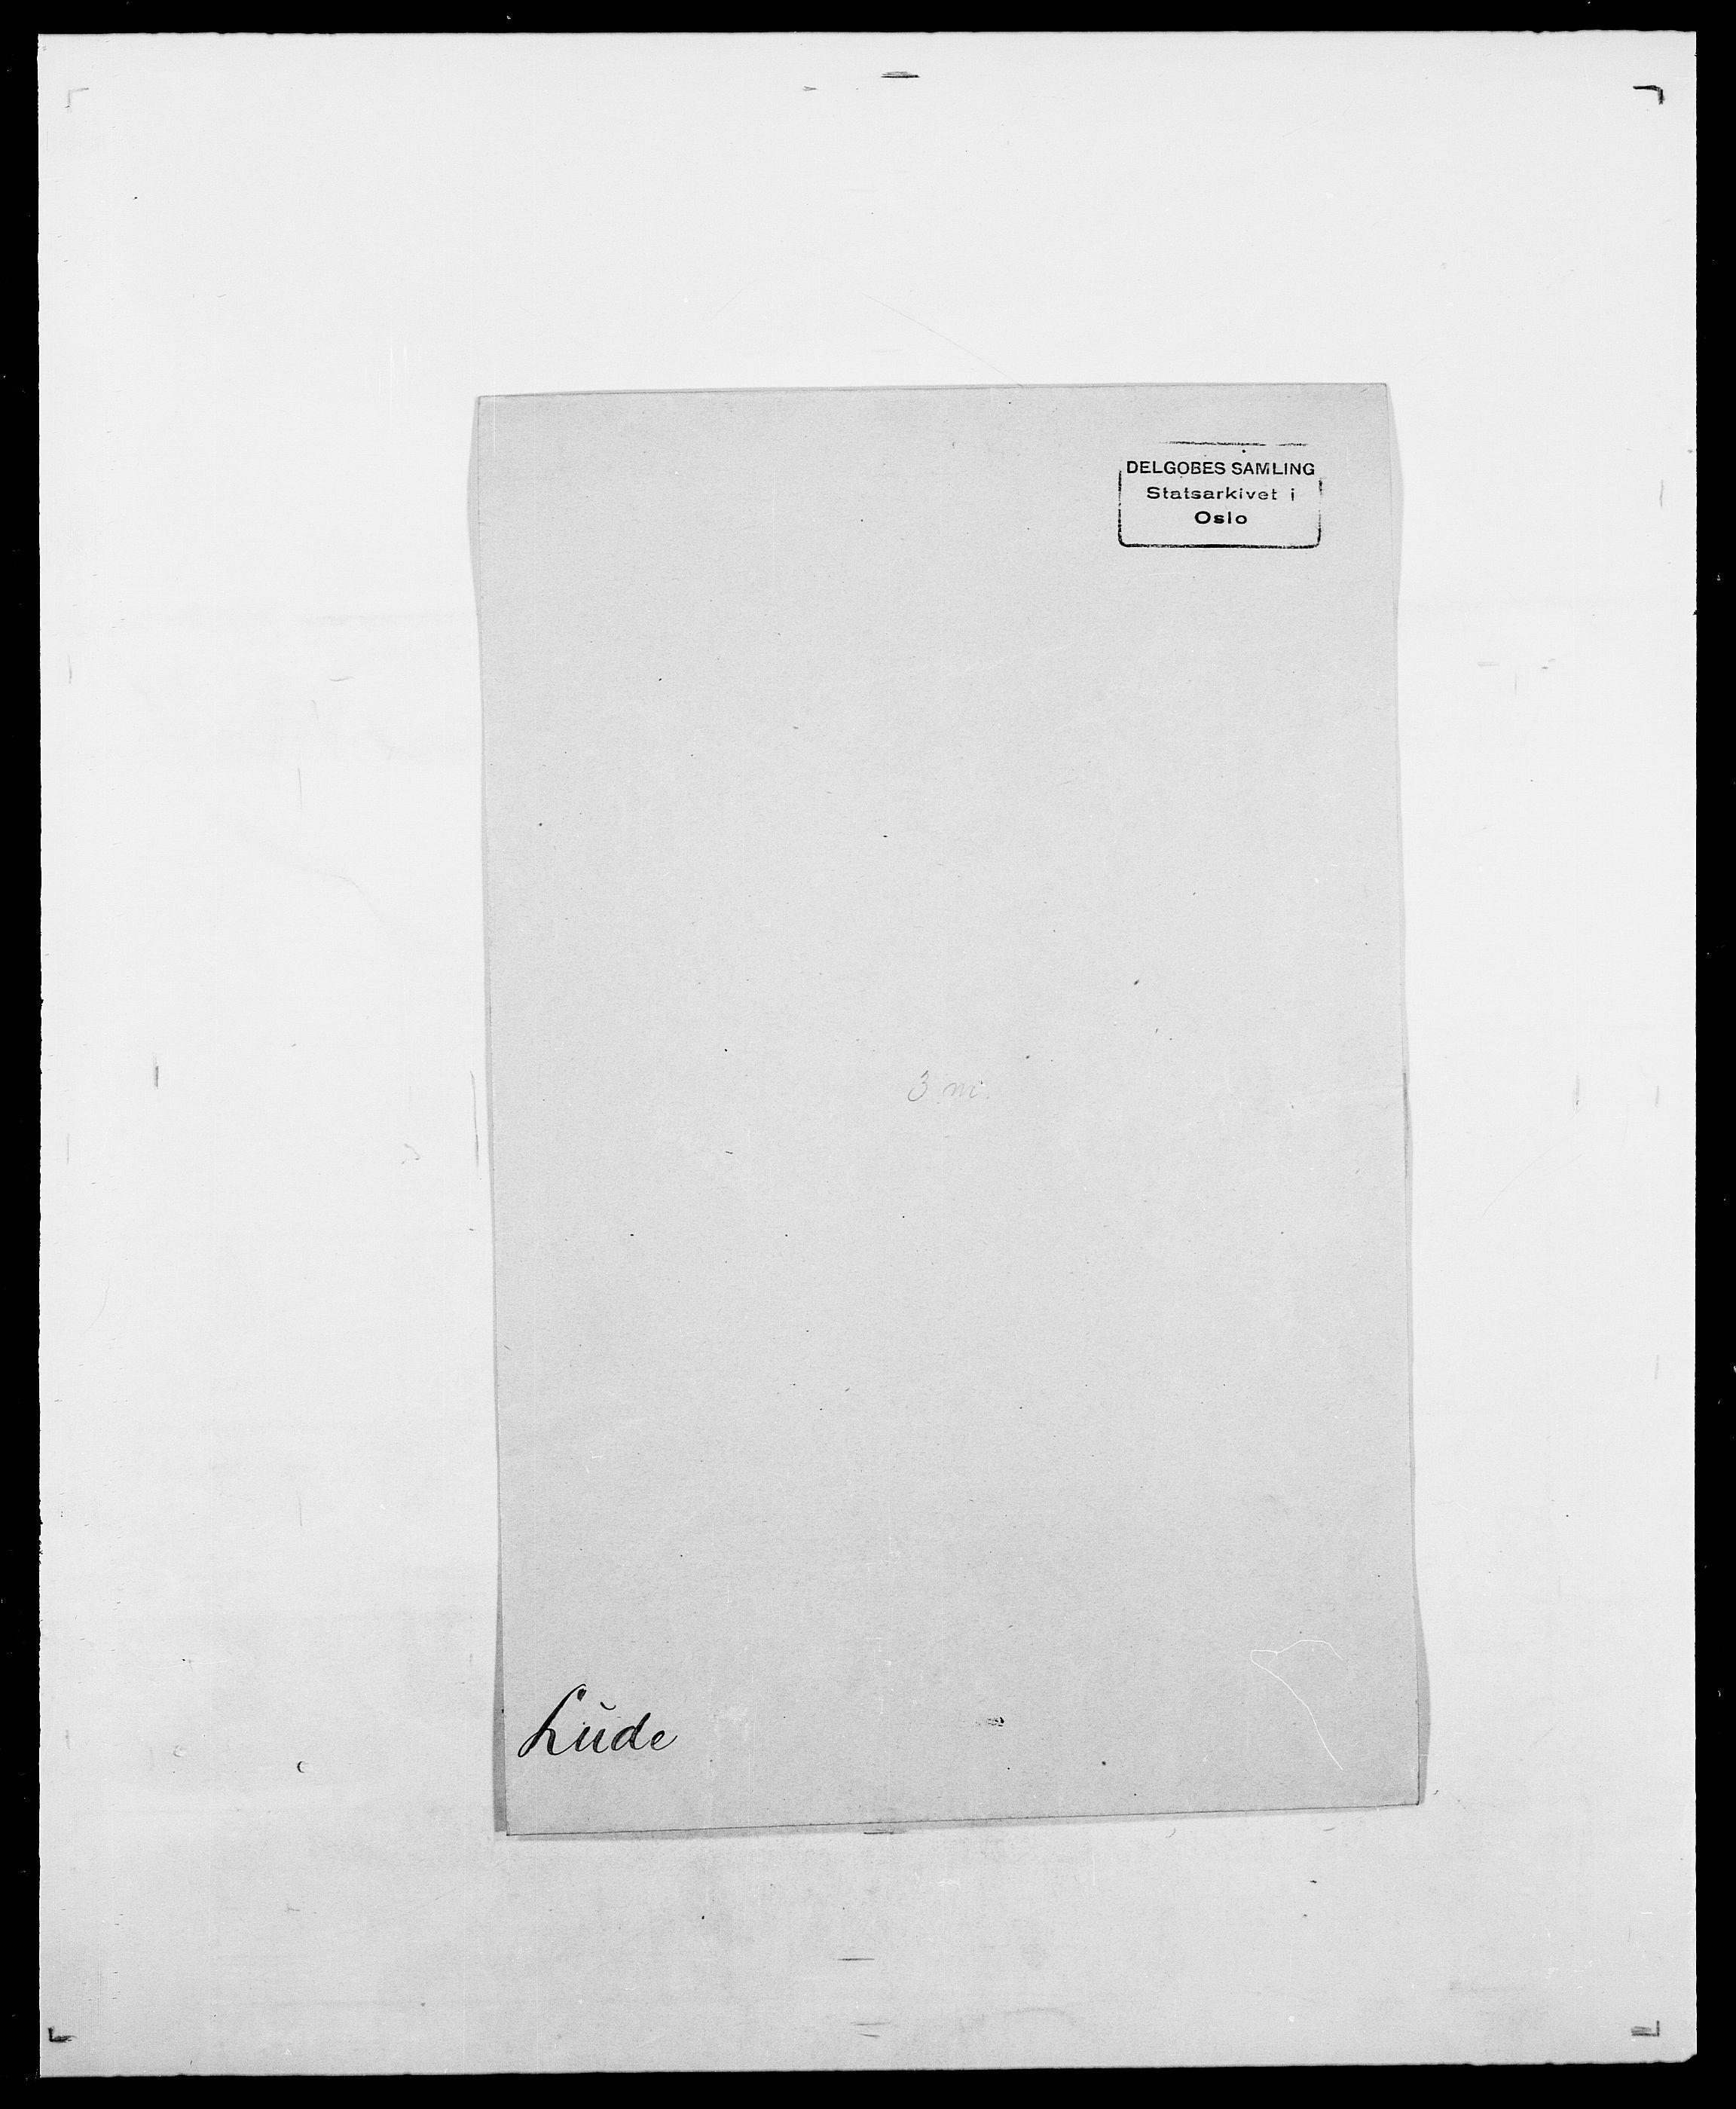 SAO, Delgobe, Charles Antoine - samling, D/Da/L0024: Lobech - Lærum, s. 368